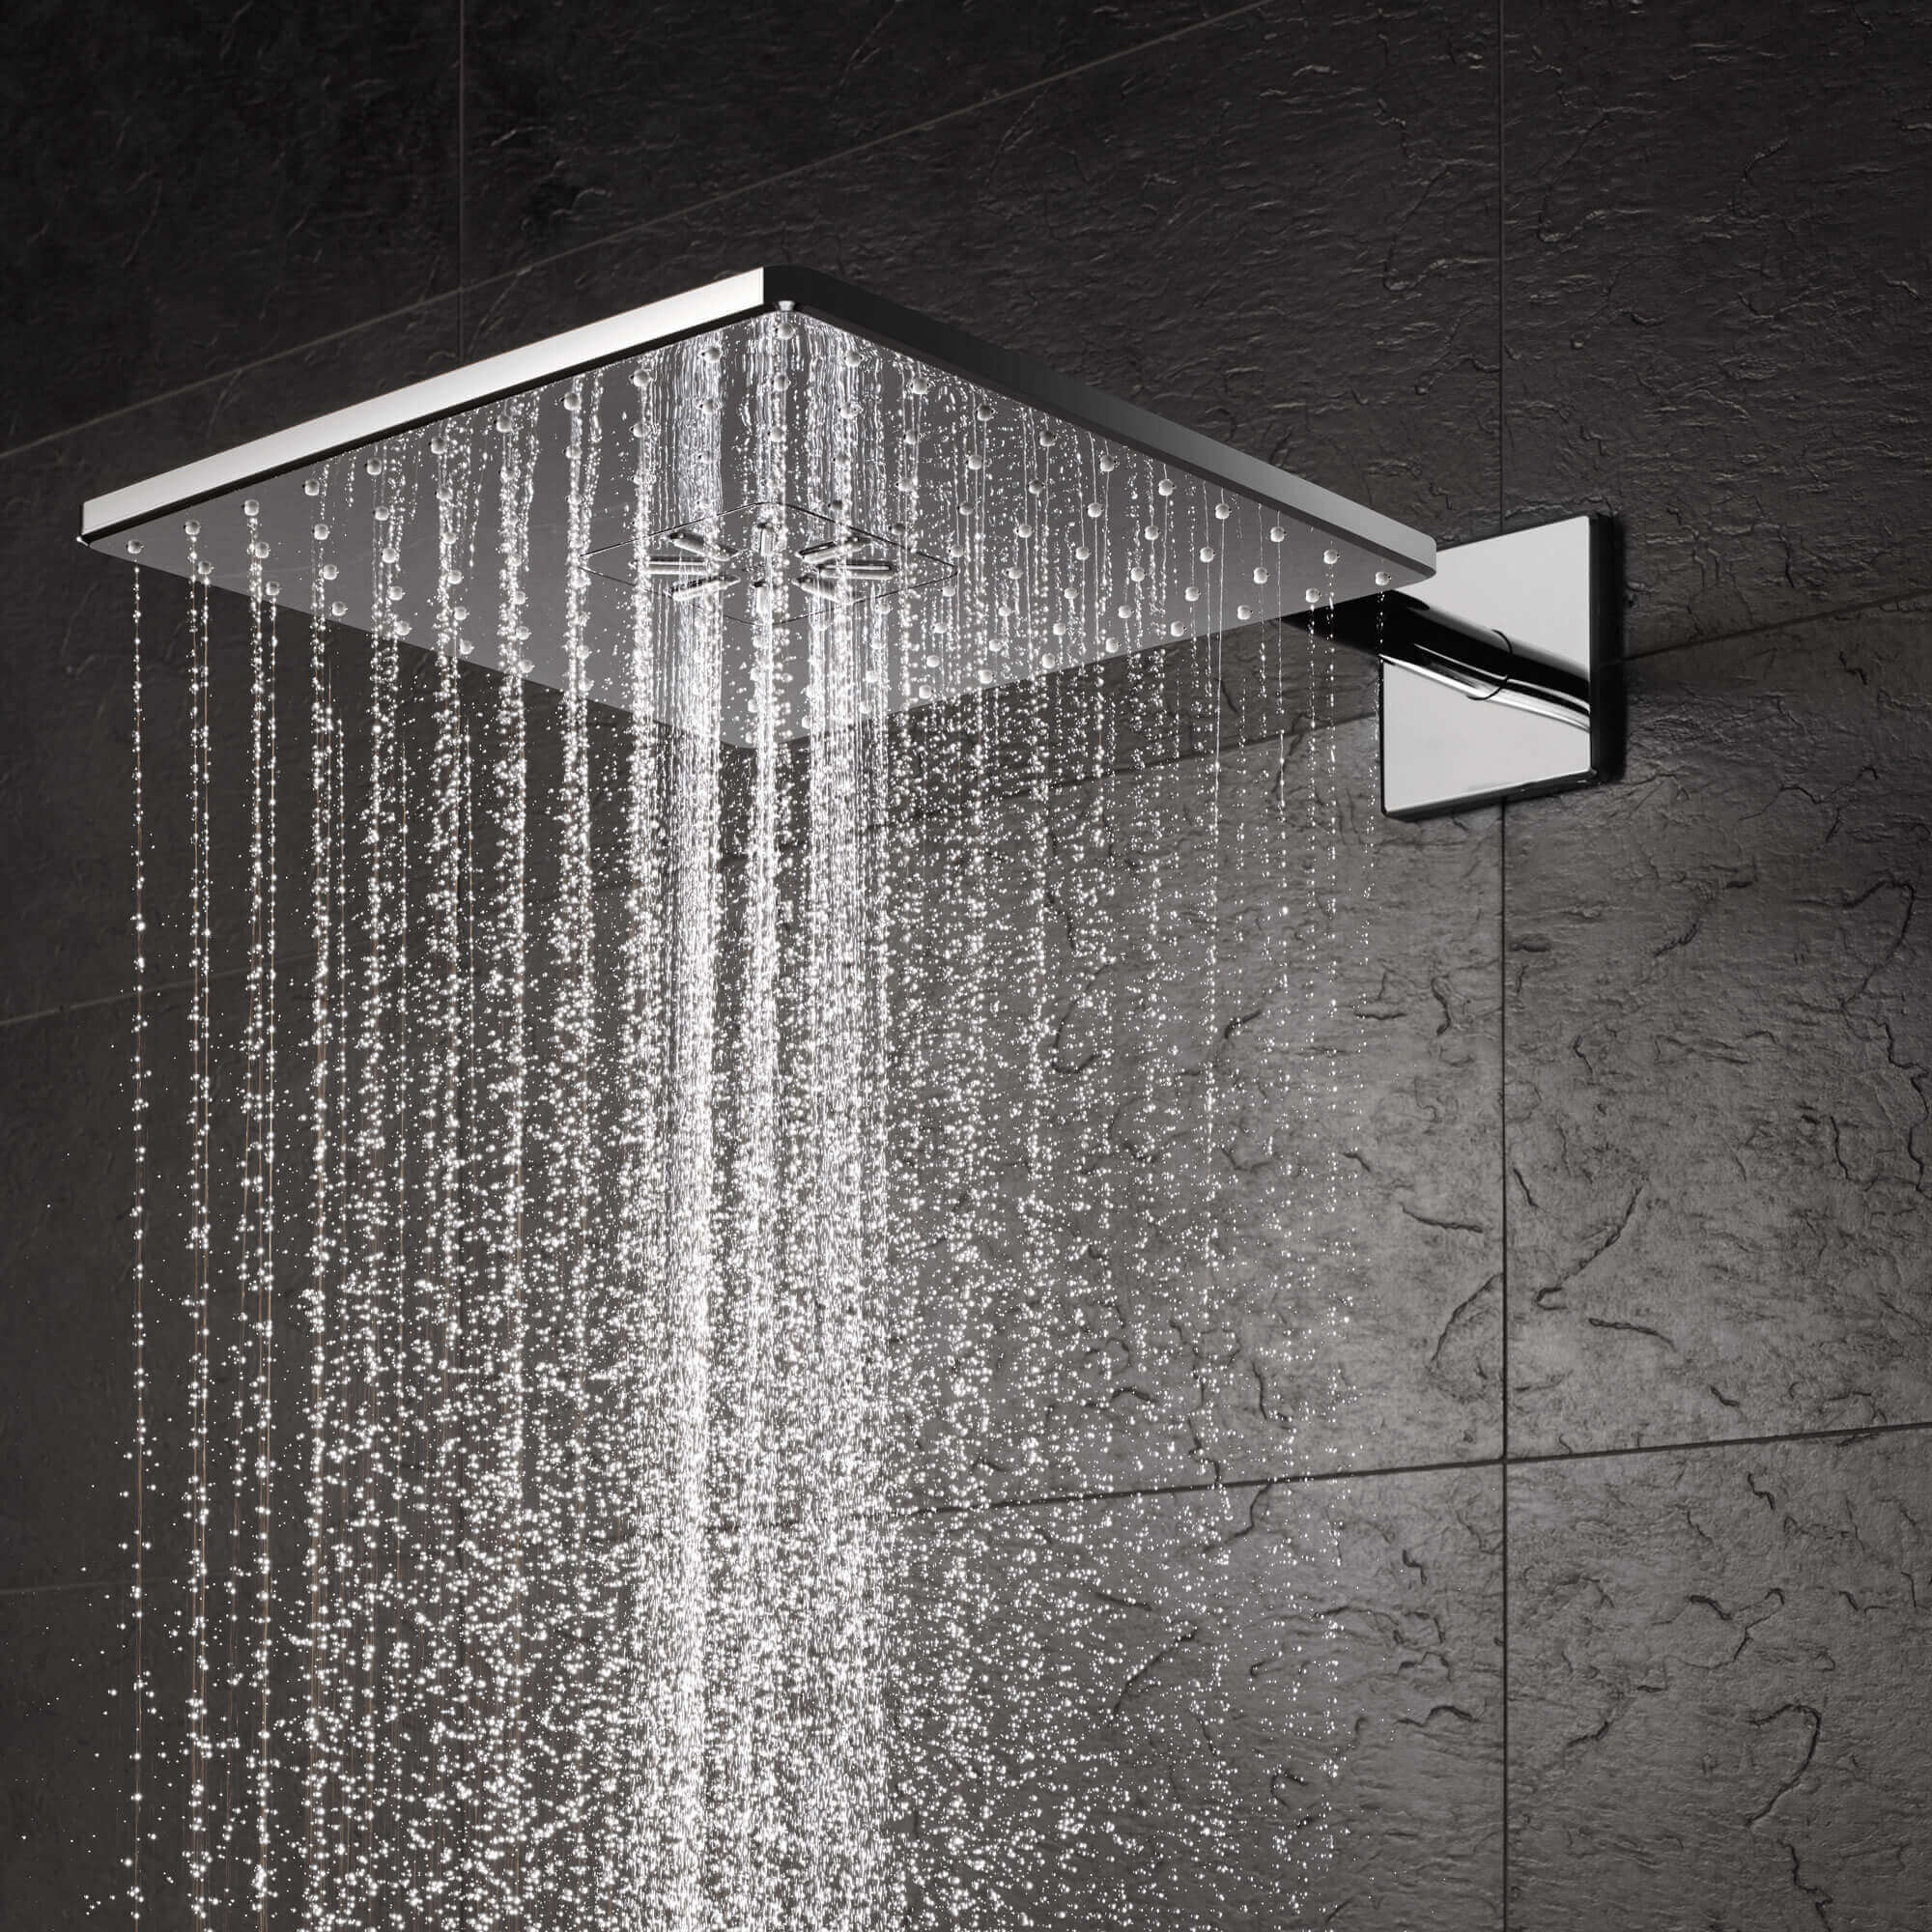 Square rainshower with running water